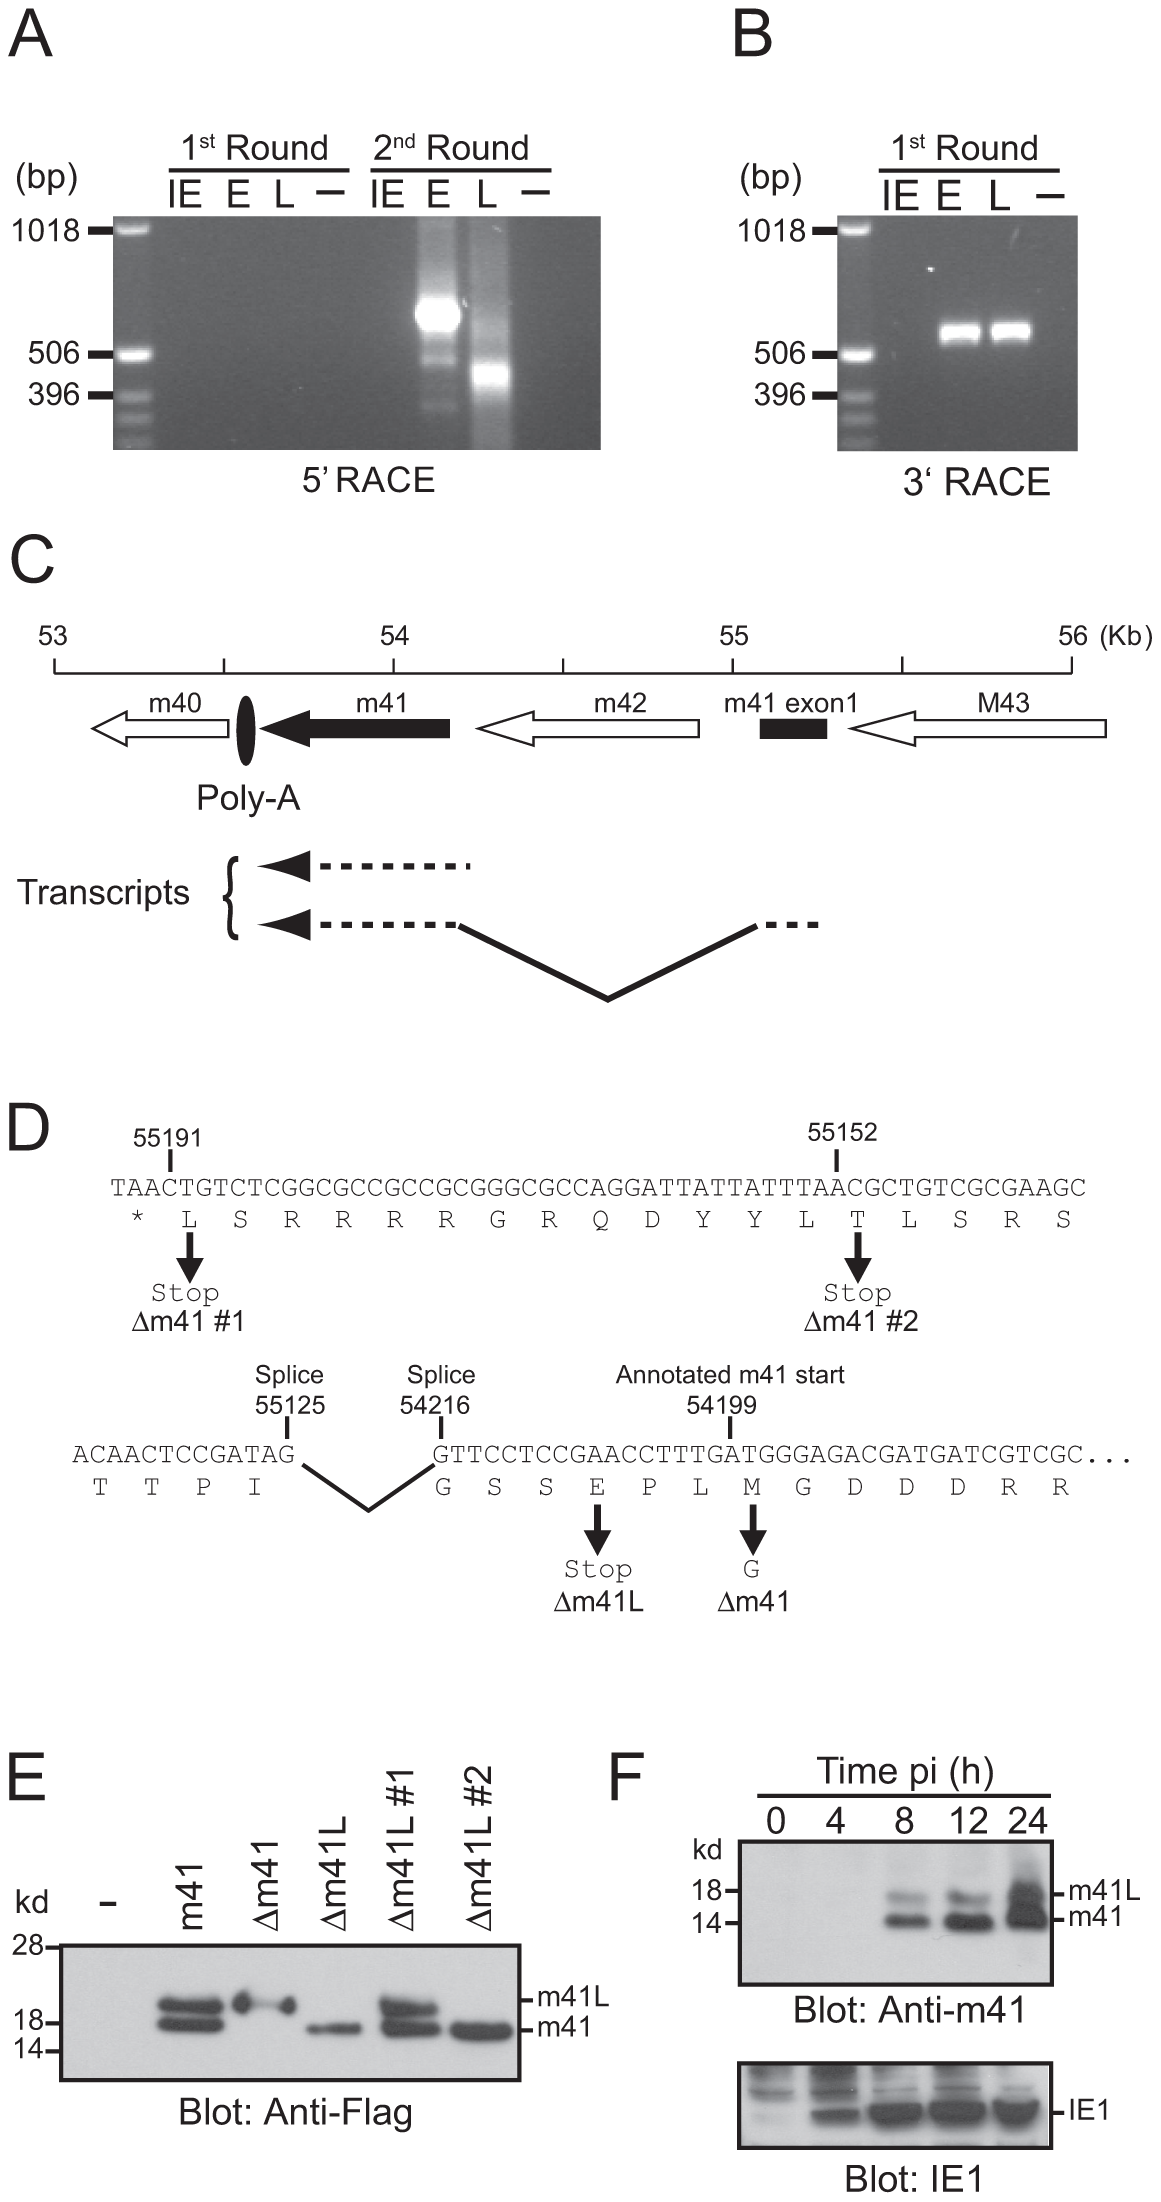 Genomic arrangement and analysis of the m41 locus.